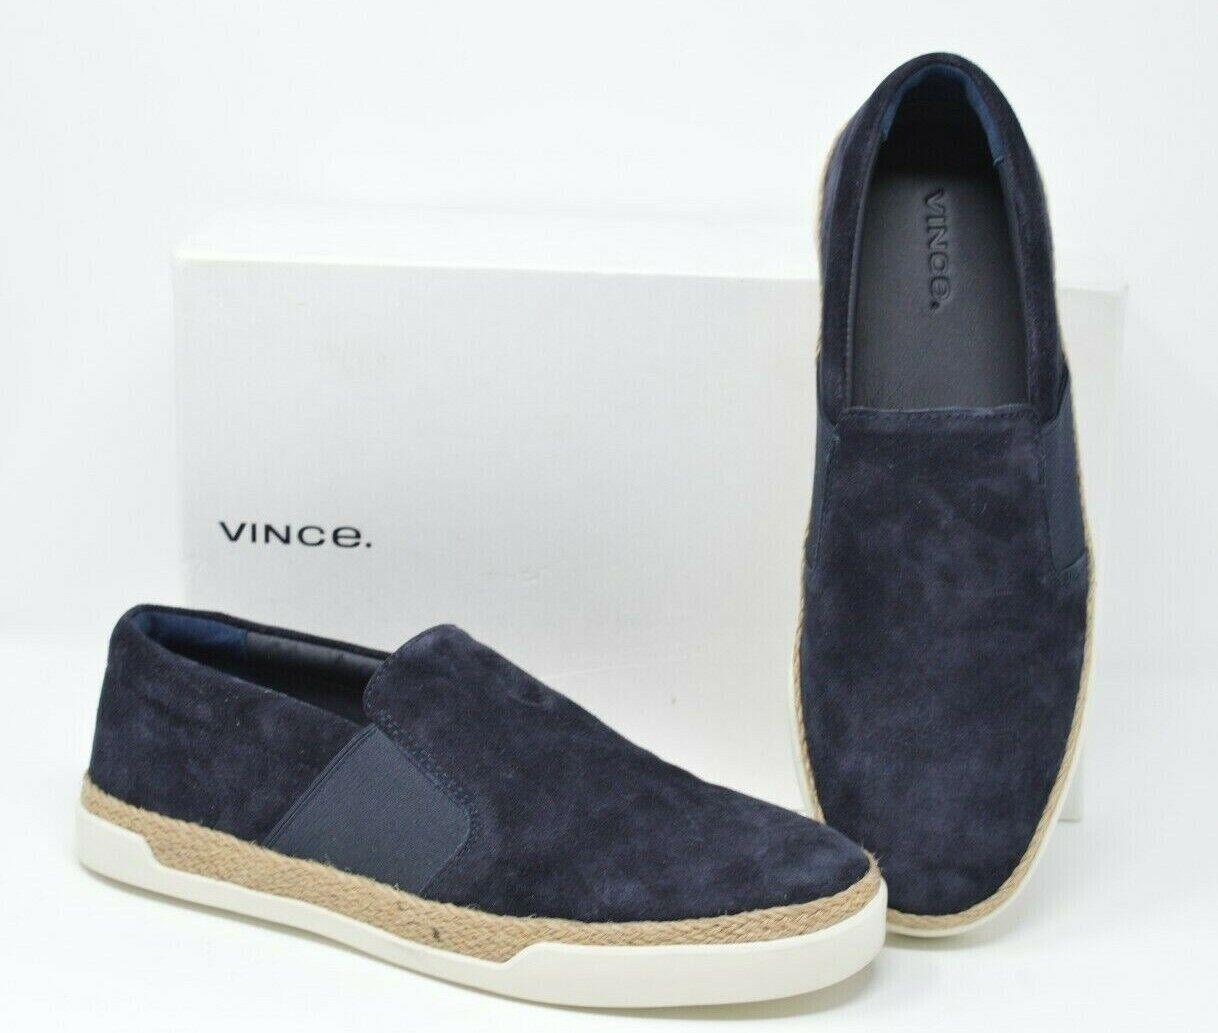 Vince Women's JOHAN Platform Slip On Fashion Sneakers Navy Suede Size 10 -  225